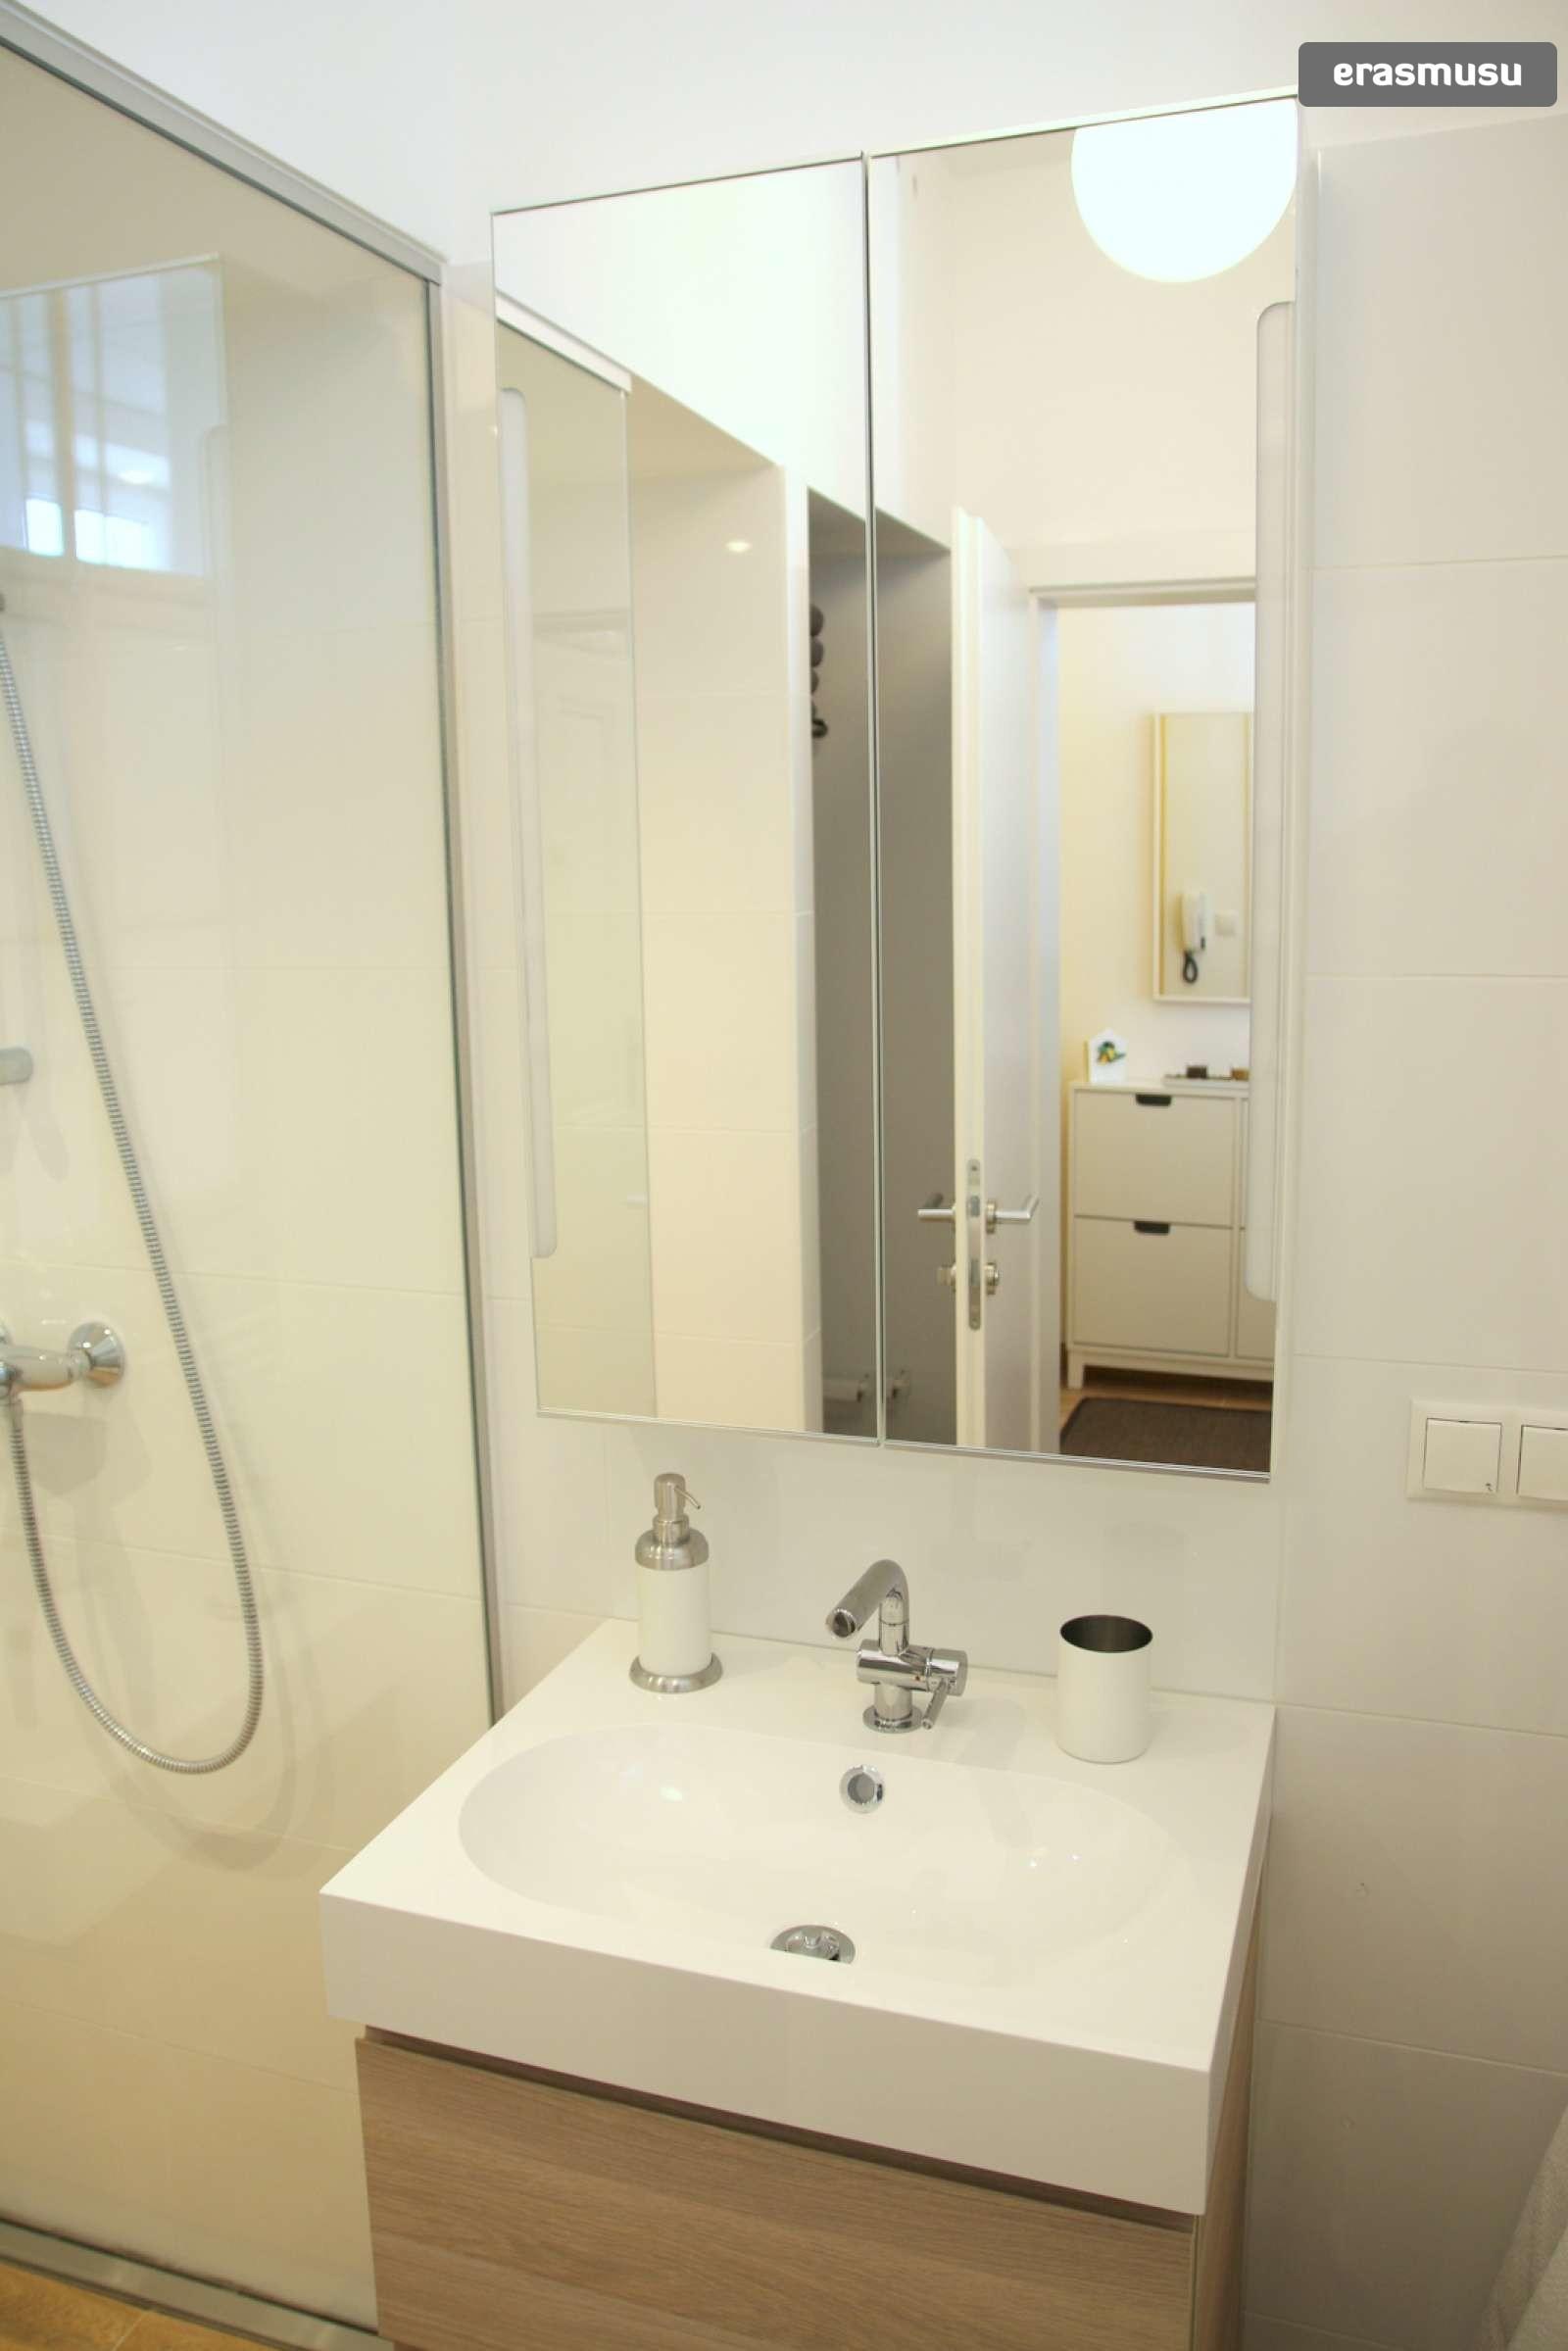 lovely-studio-apartment-rent-wahring-38c063a6da7b7e7504d9b6c7f97